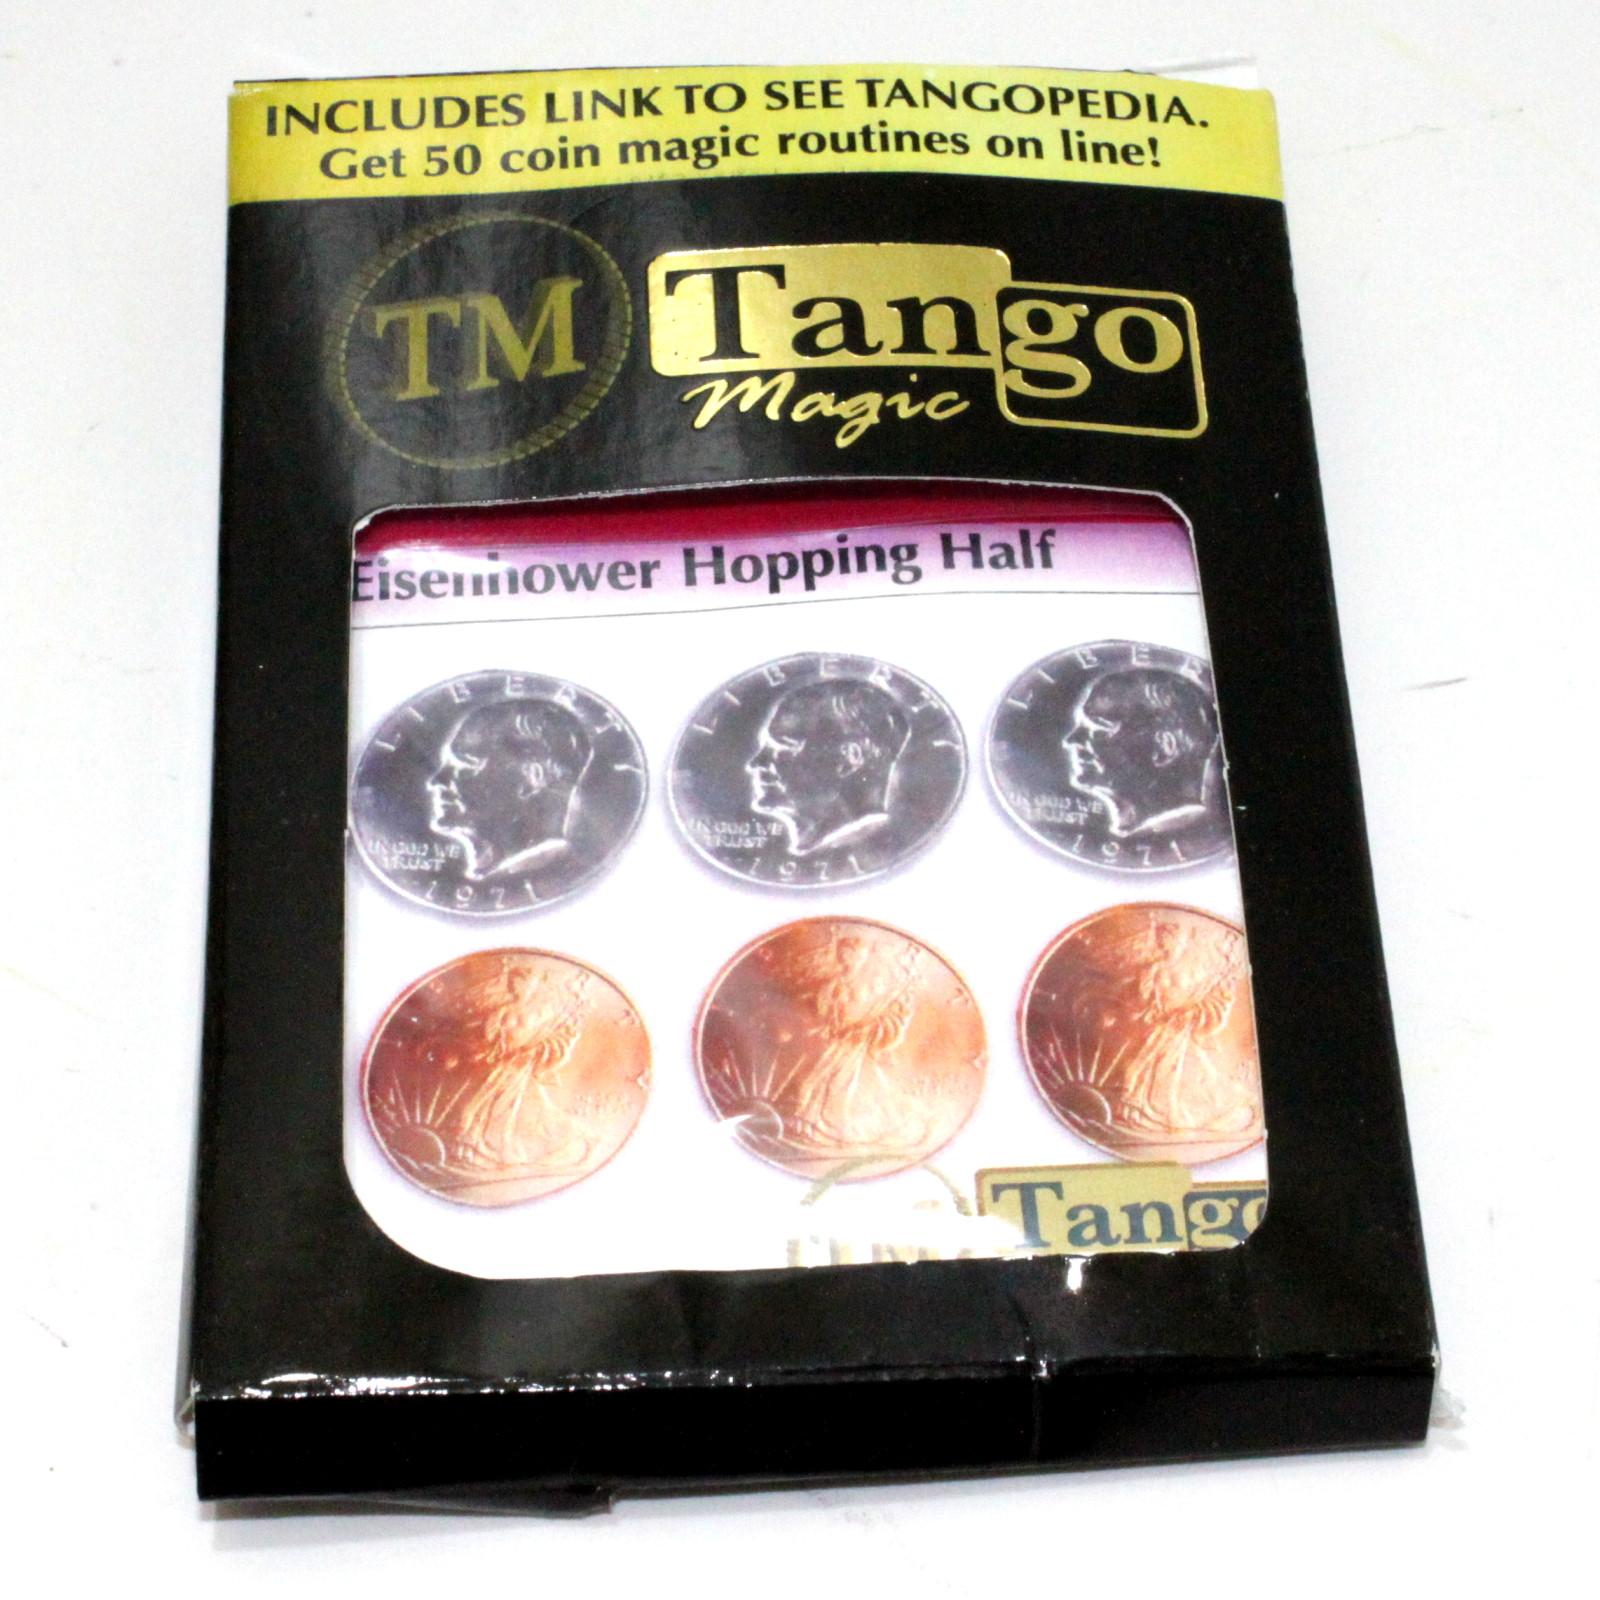 Hopping Half (Eisenhower Dollar) by Tango Magic